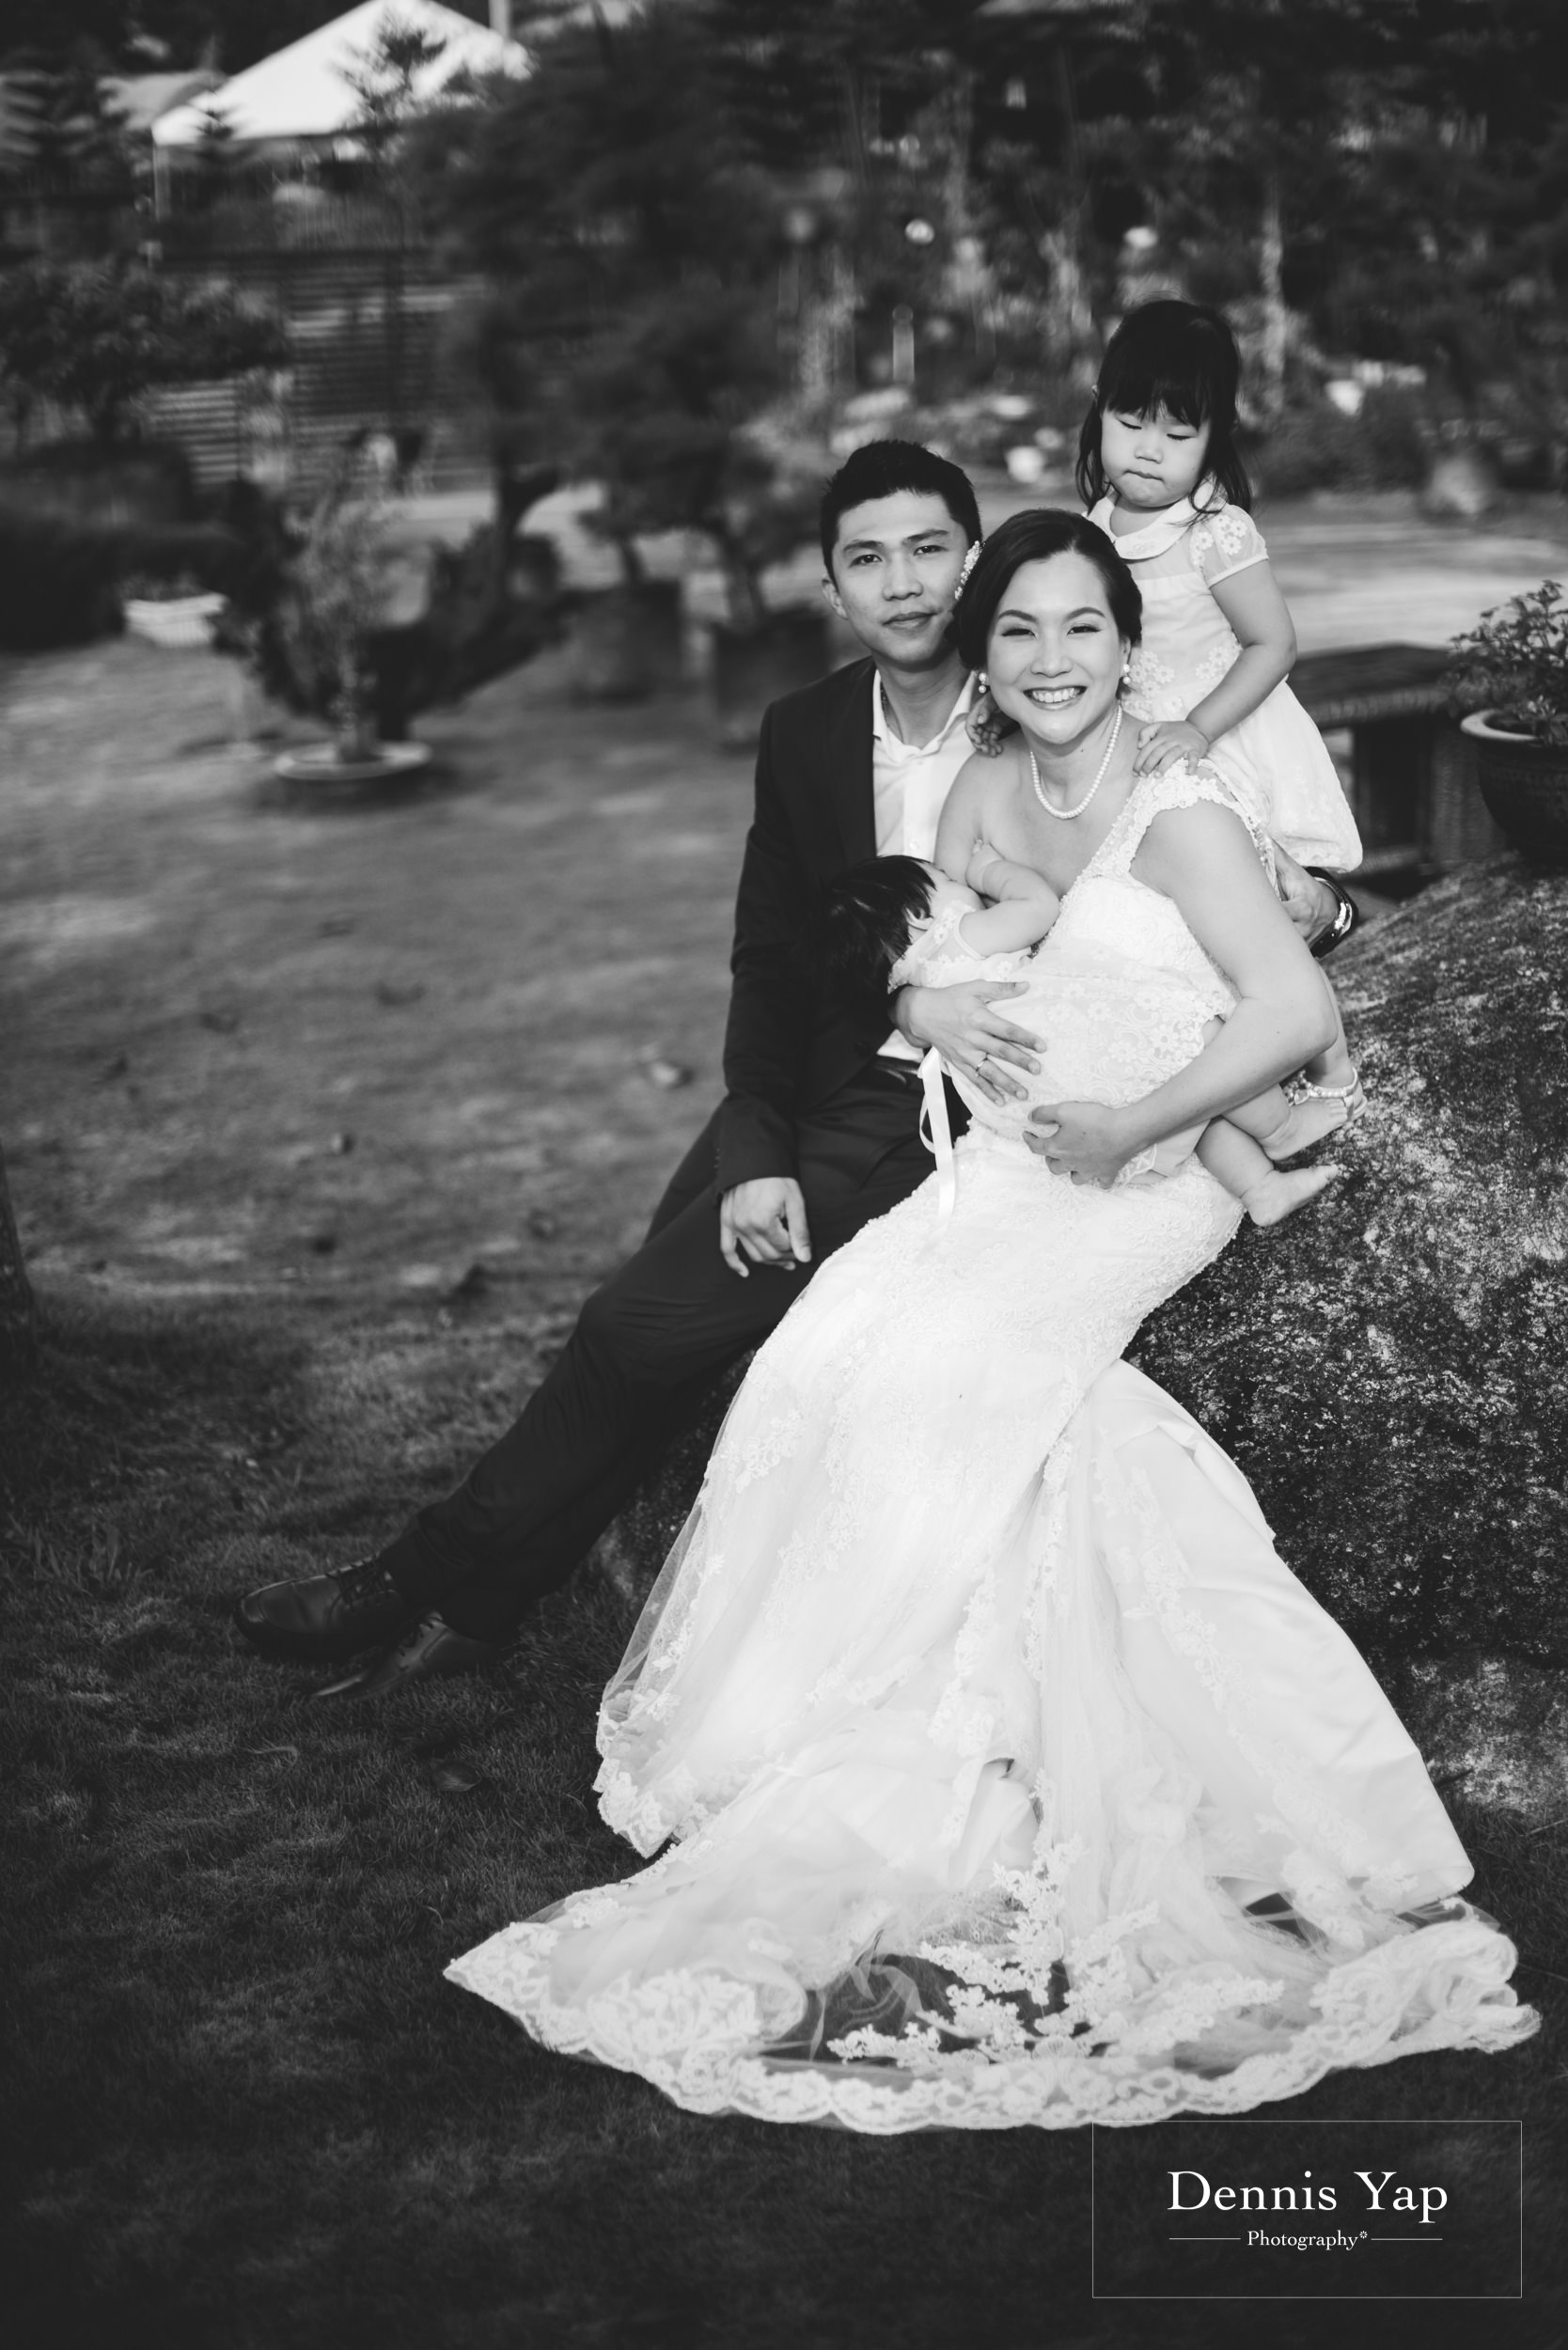 jung munn yein prewedding baby family dennis yap photography janda baik-3.jpg